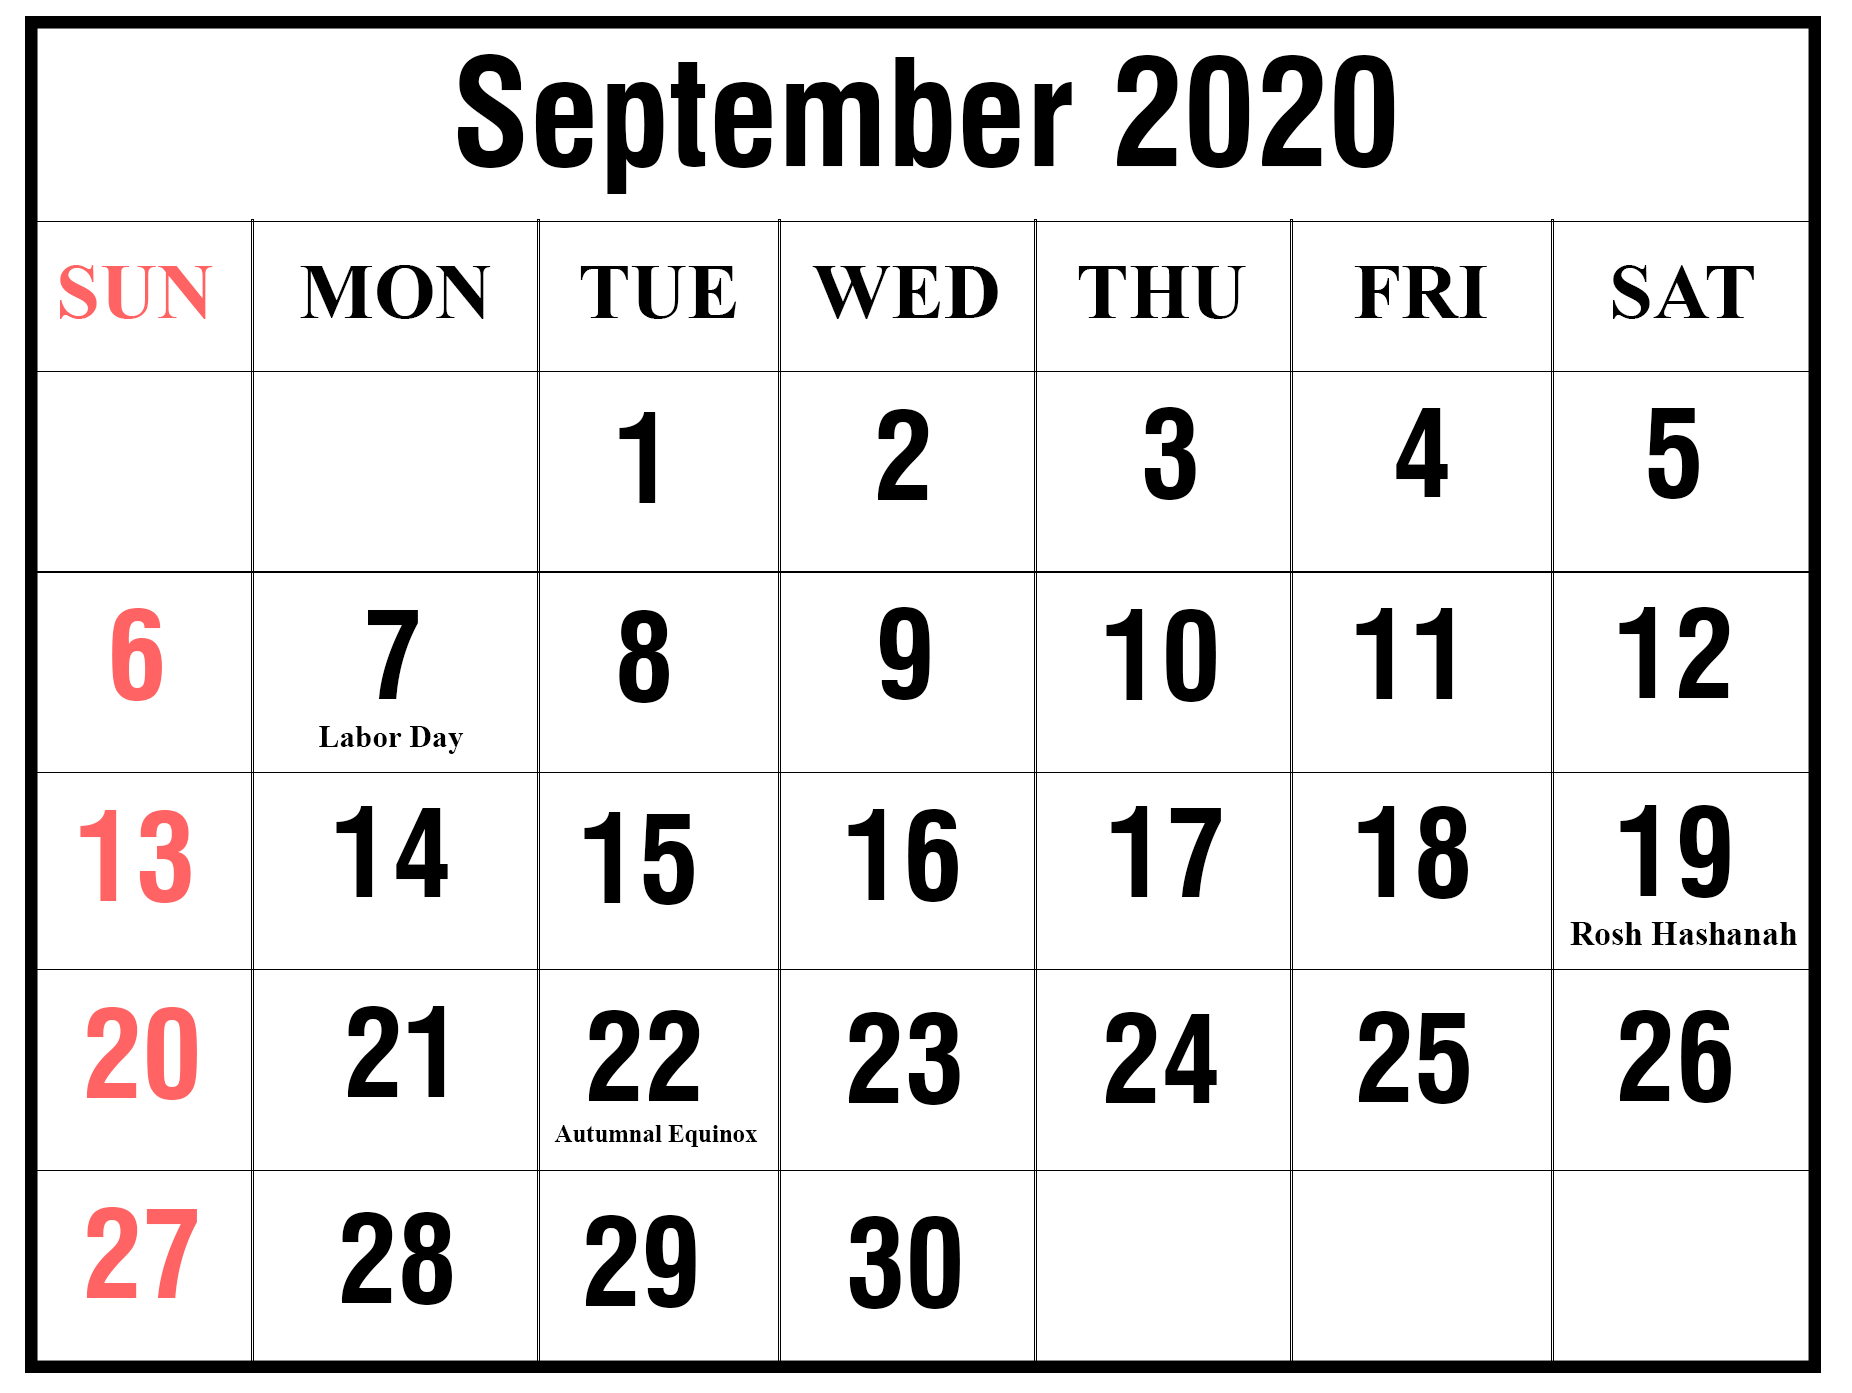 September 2020 Holidays Calendar Template